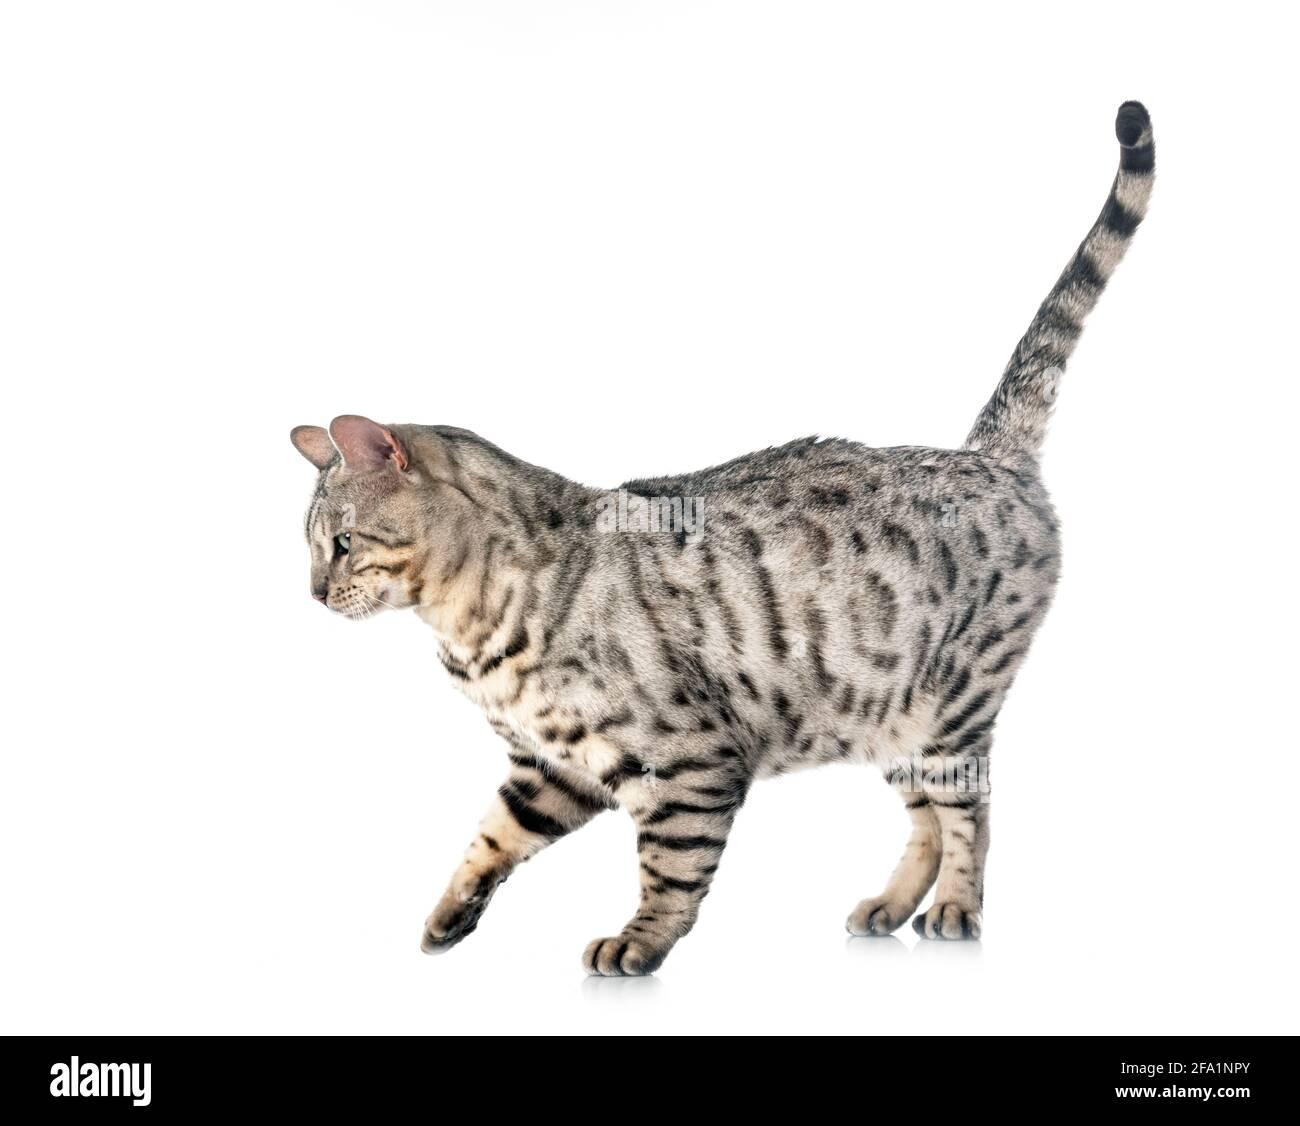 Gato de Bengala en la parte delantera del fondo blanco. Foto de stock